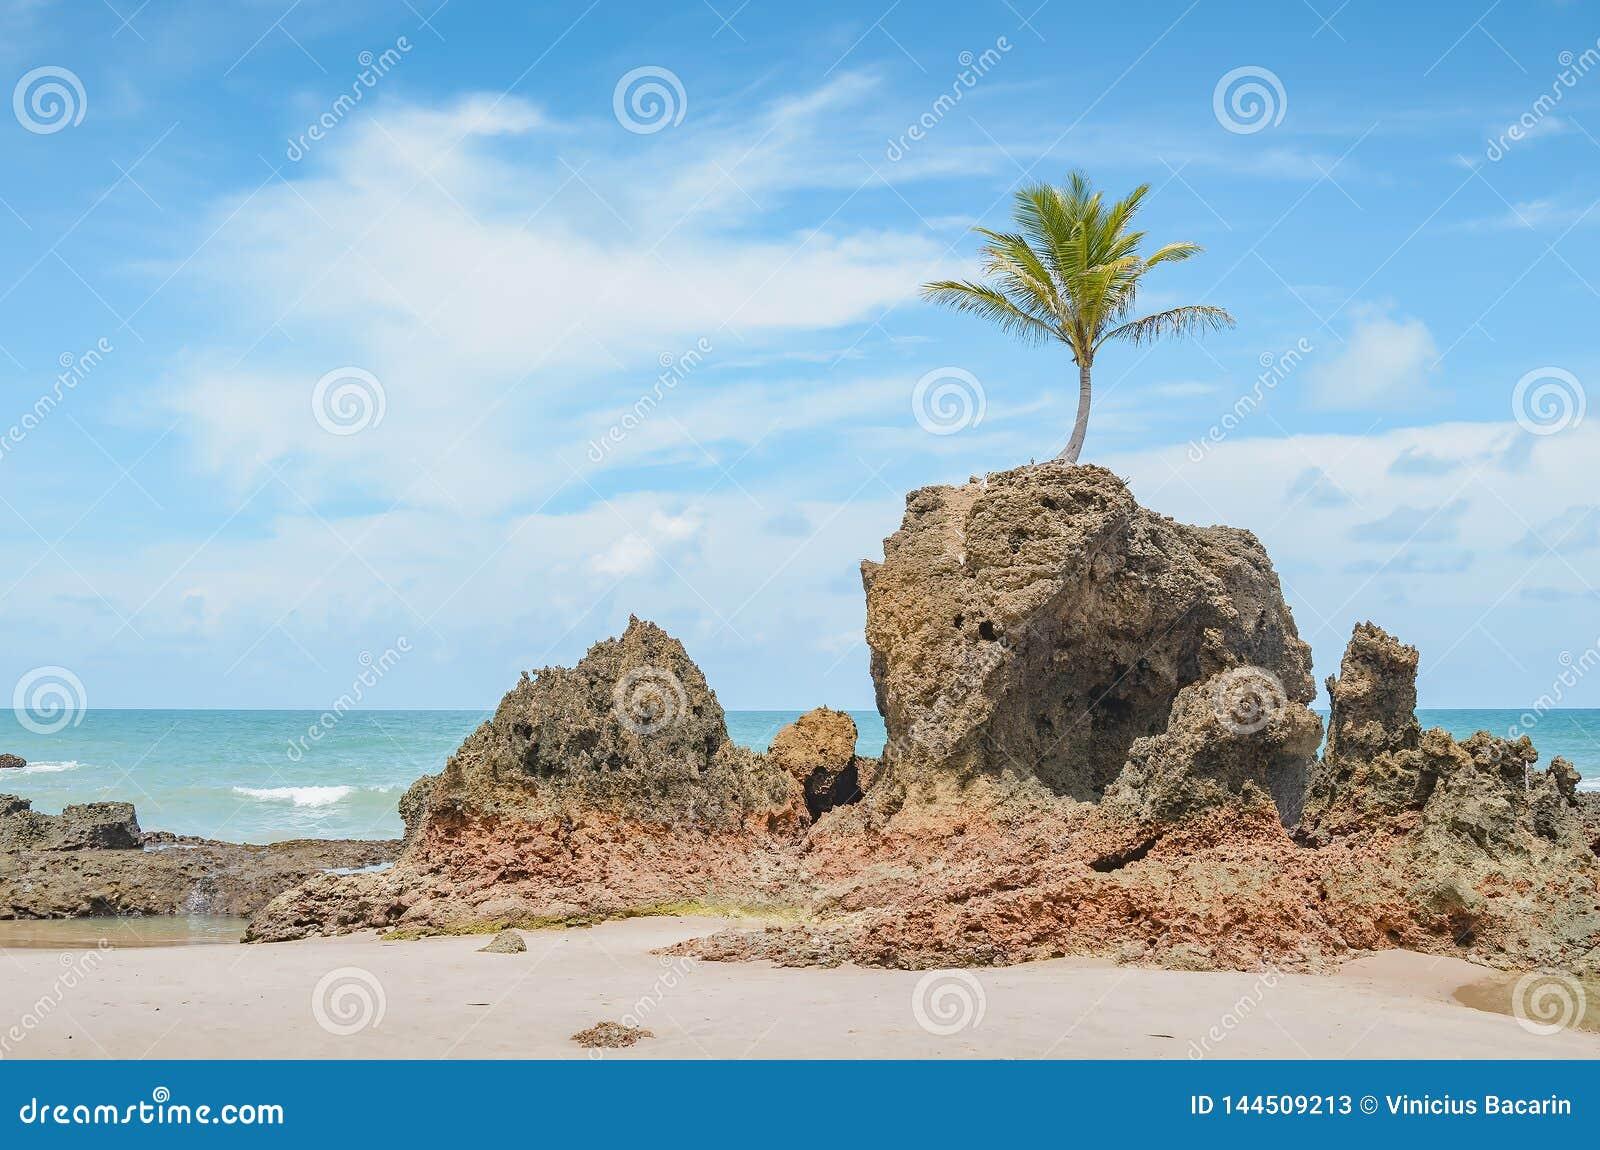 Praia De Tambaba, Conde PB Brazil Stock Photo - Image of